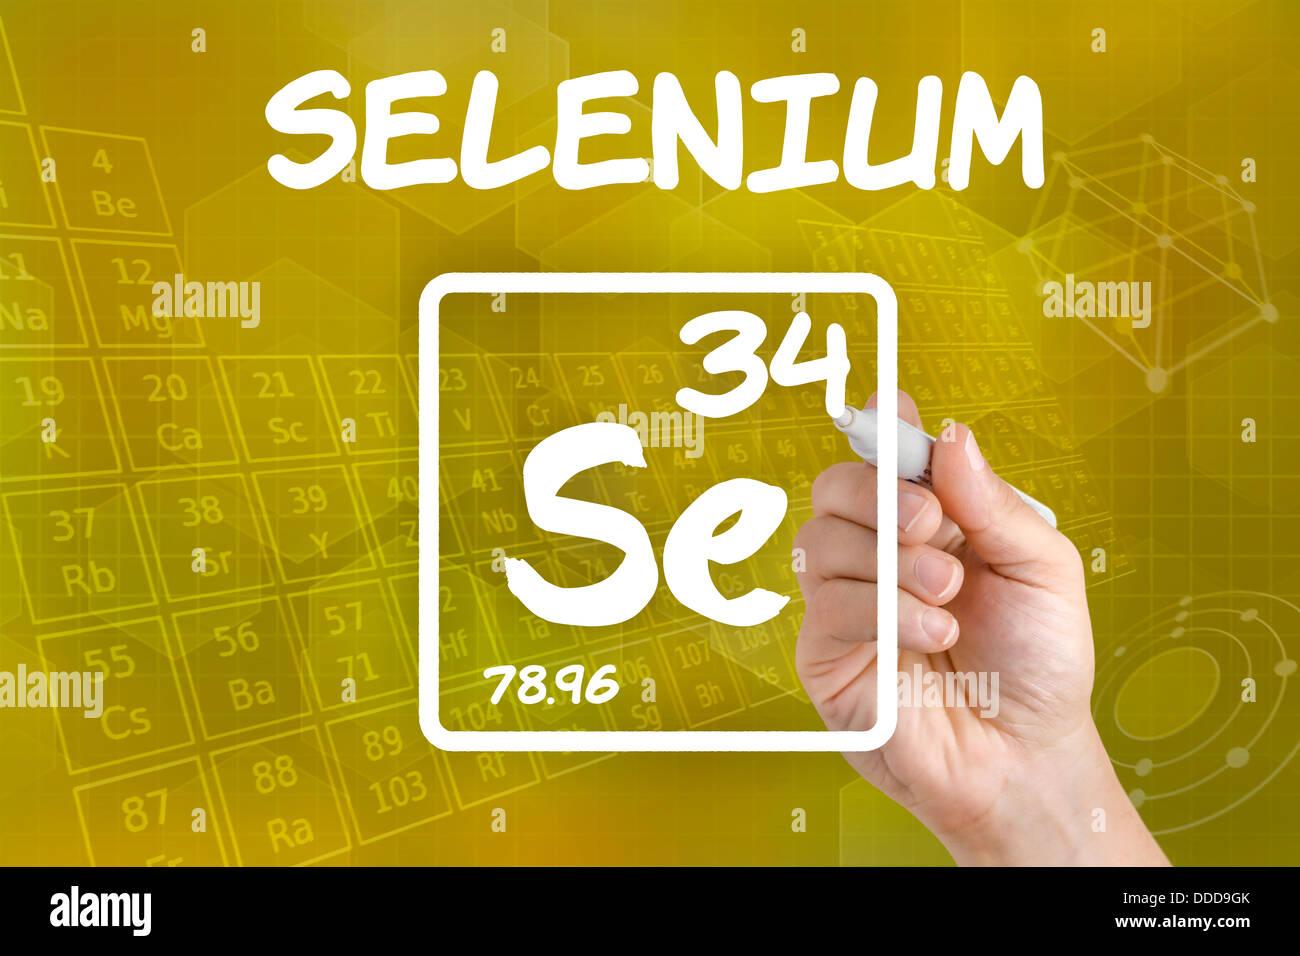 Symbol for the chemical element selenium stock photo royalty free symbol for the chemical element selenium buycottarizona